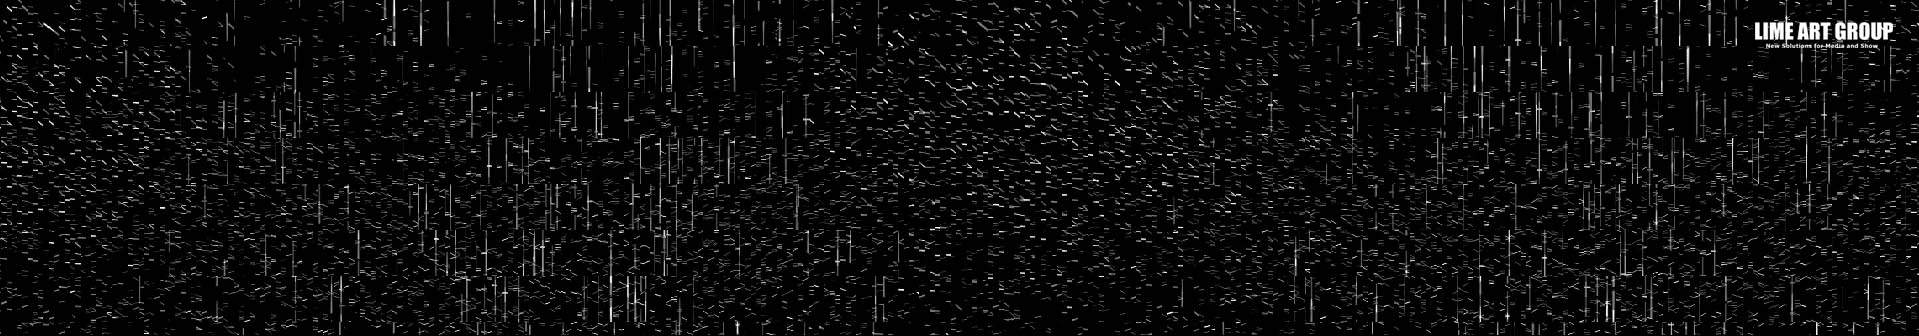 candy vj loops motion background video loop 7